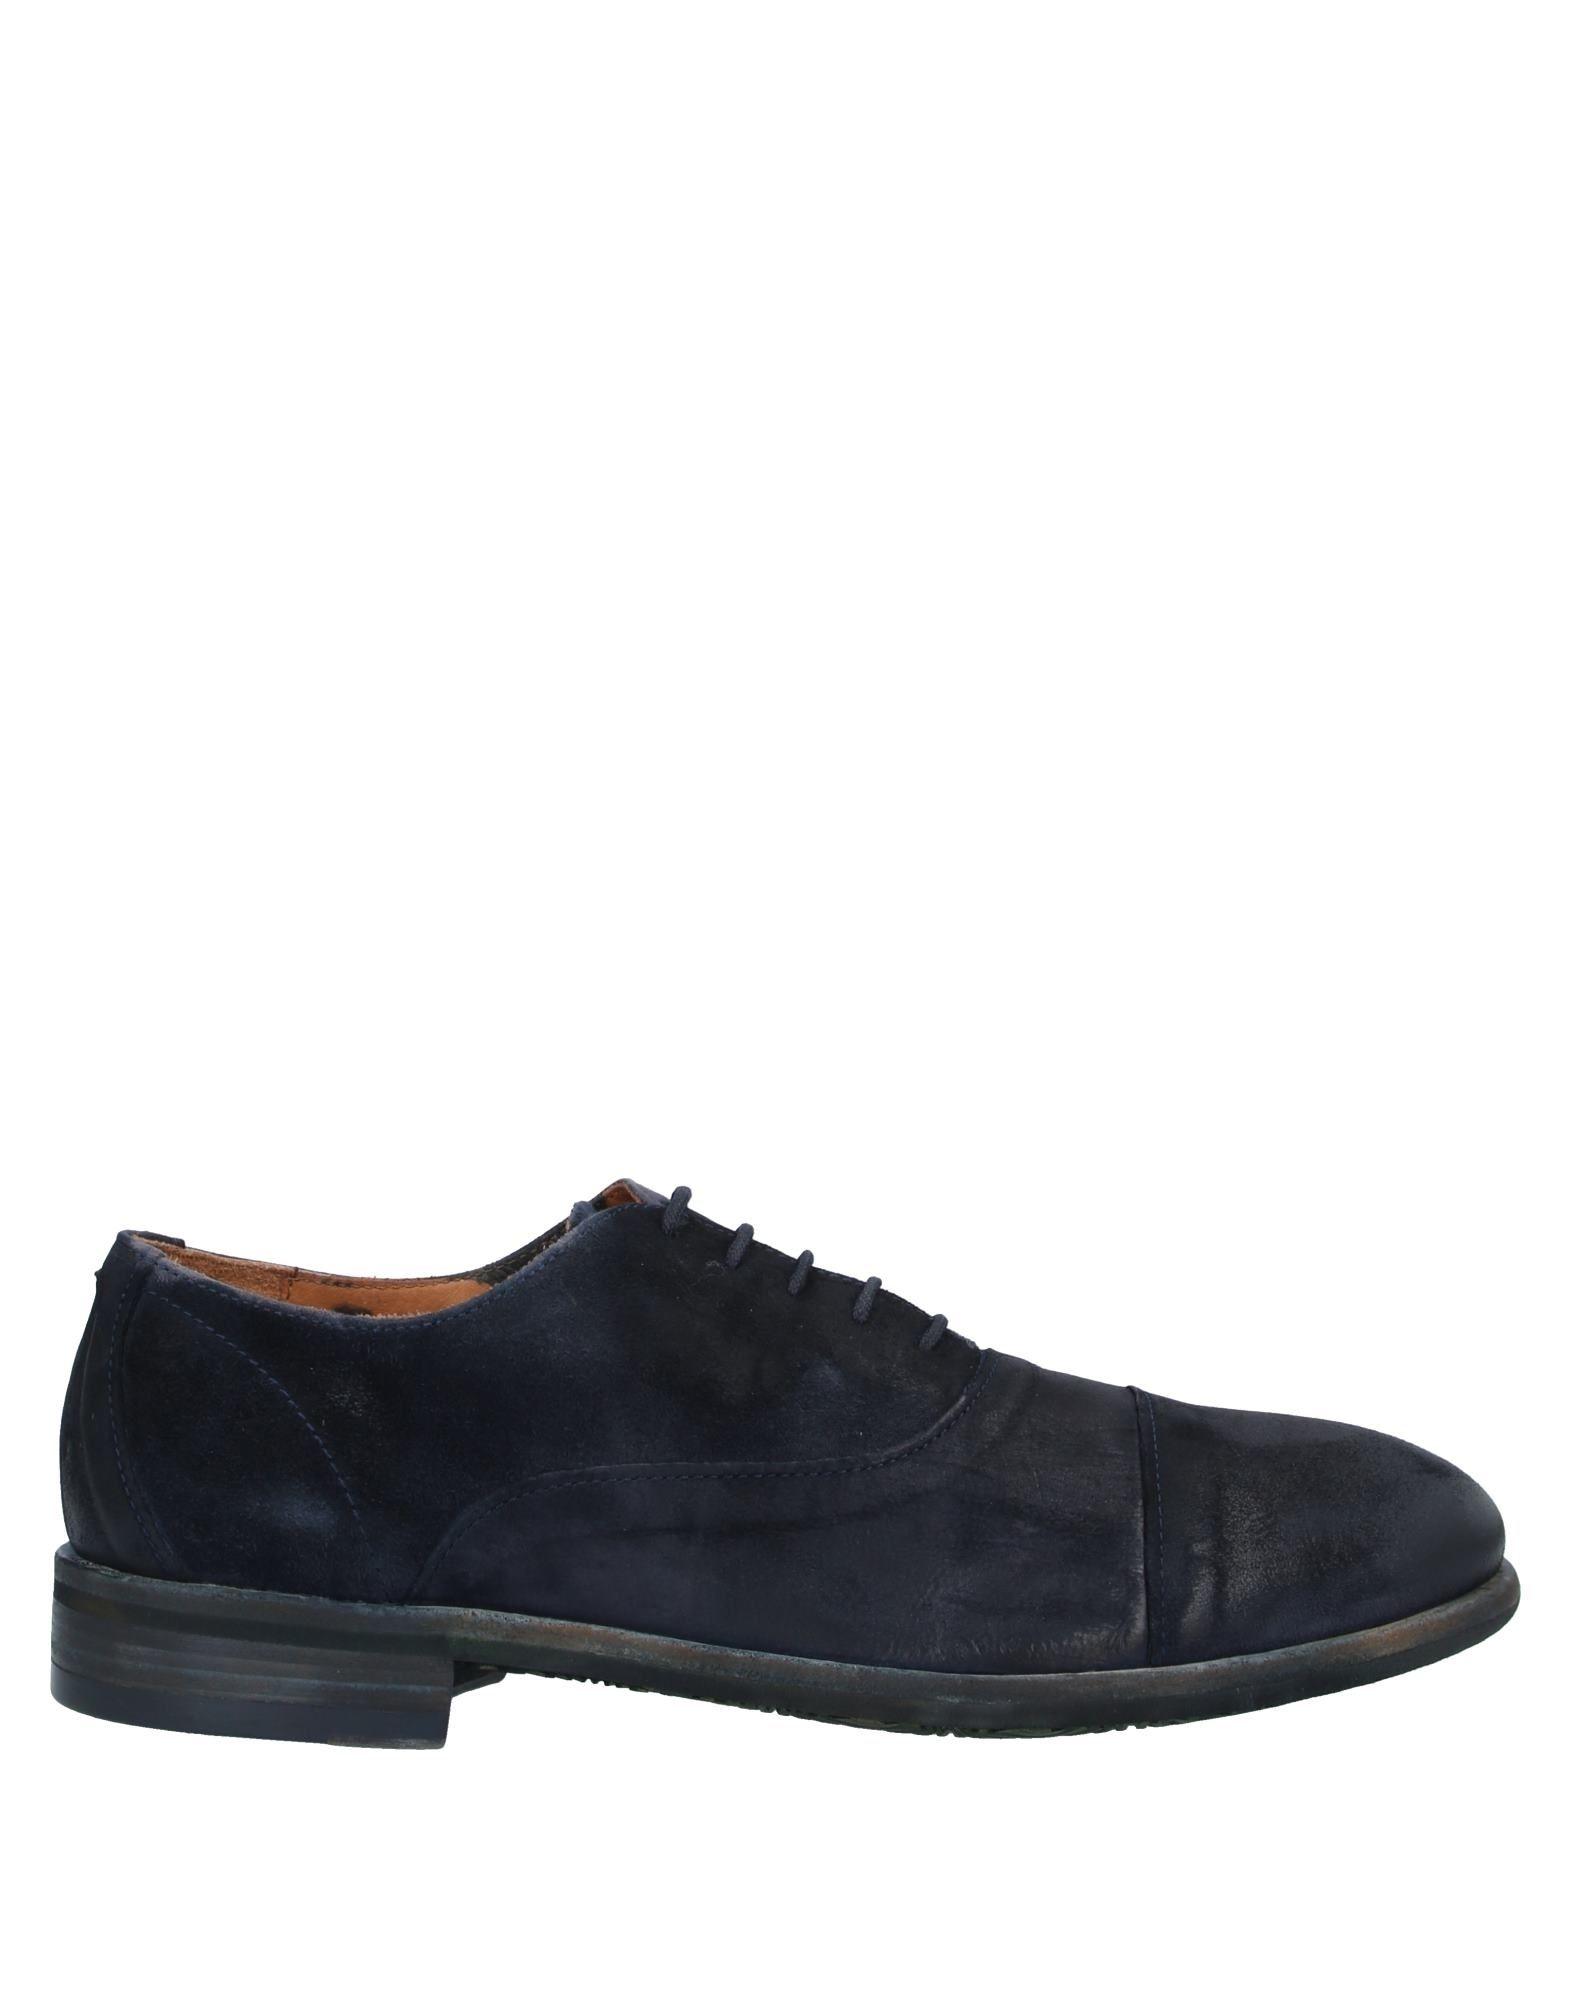 Chaussures À Lacets Pawelk's Homme - Chaussures À Lacets Pawelk's   - 11712164XM